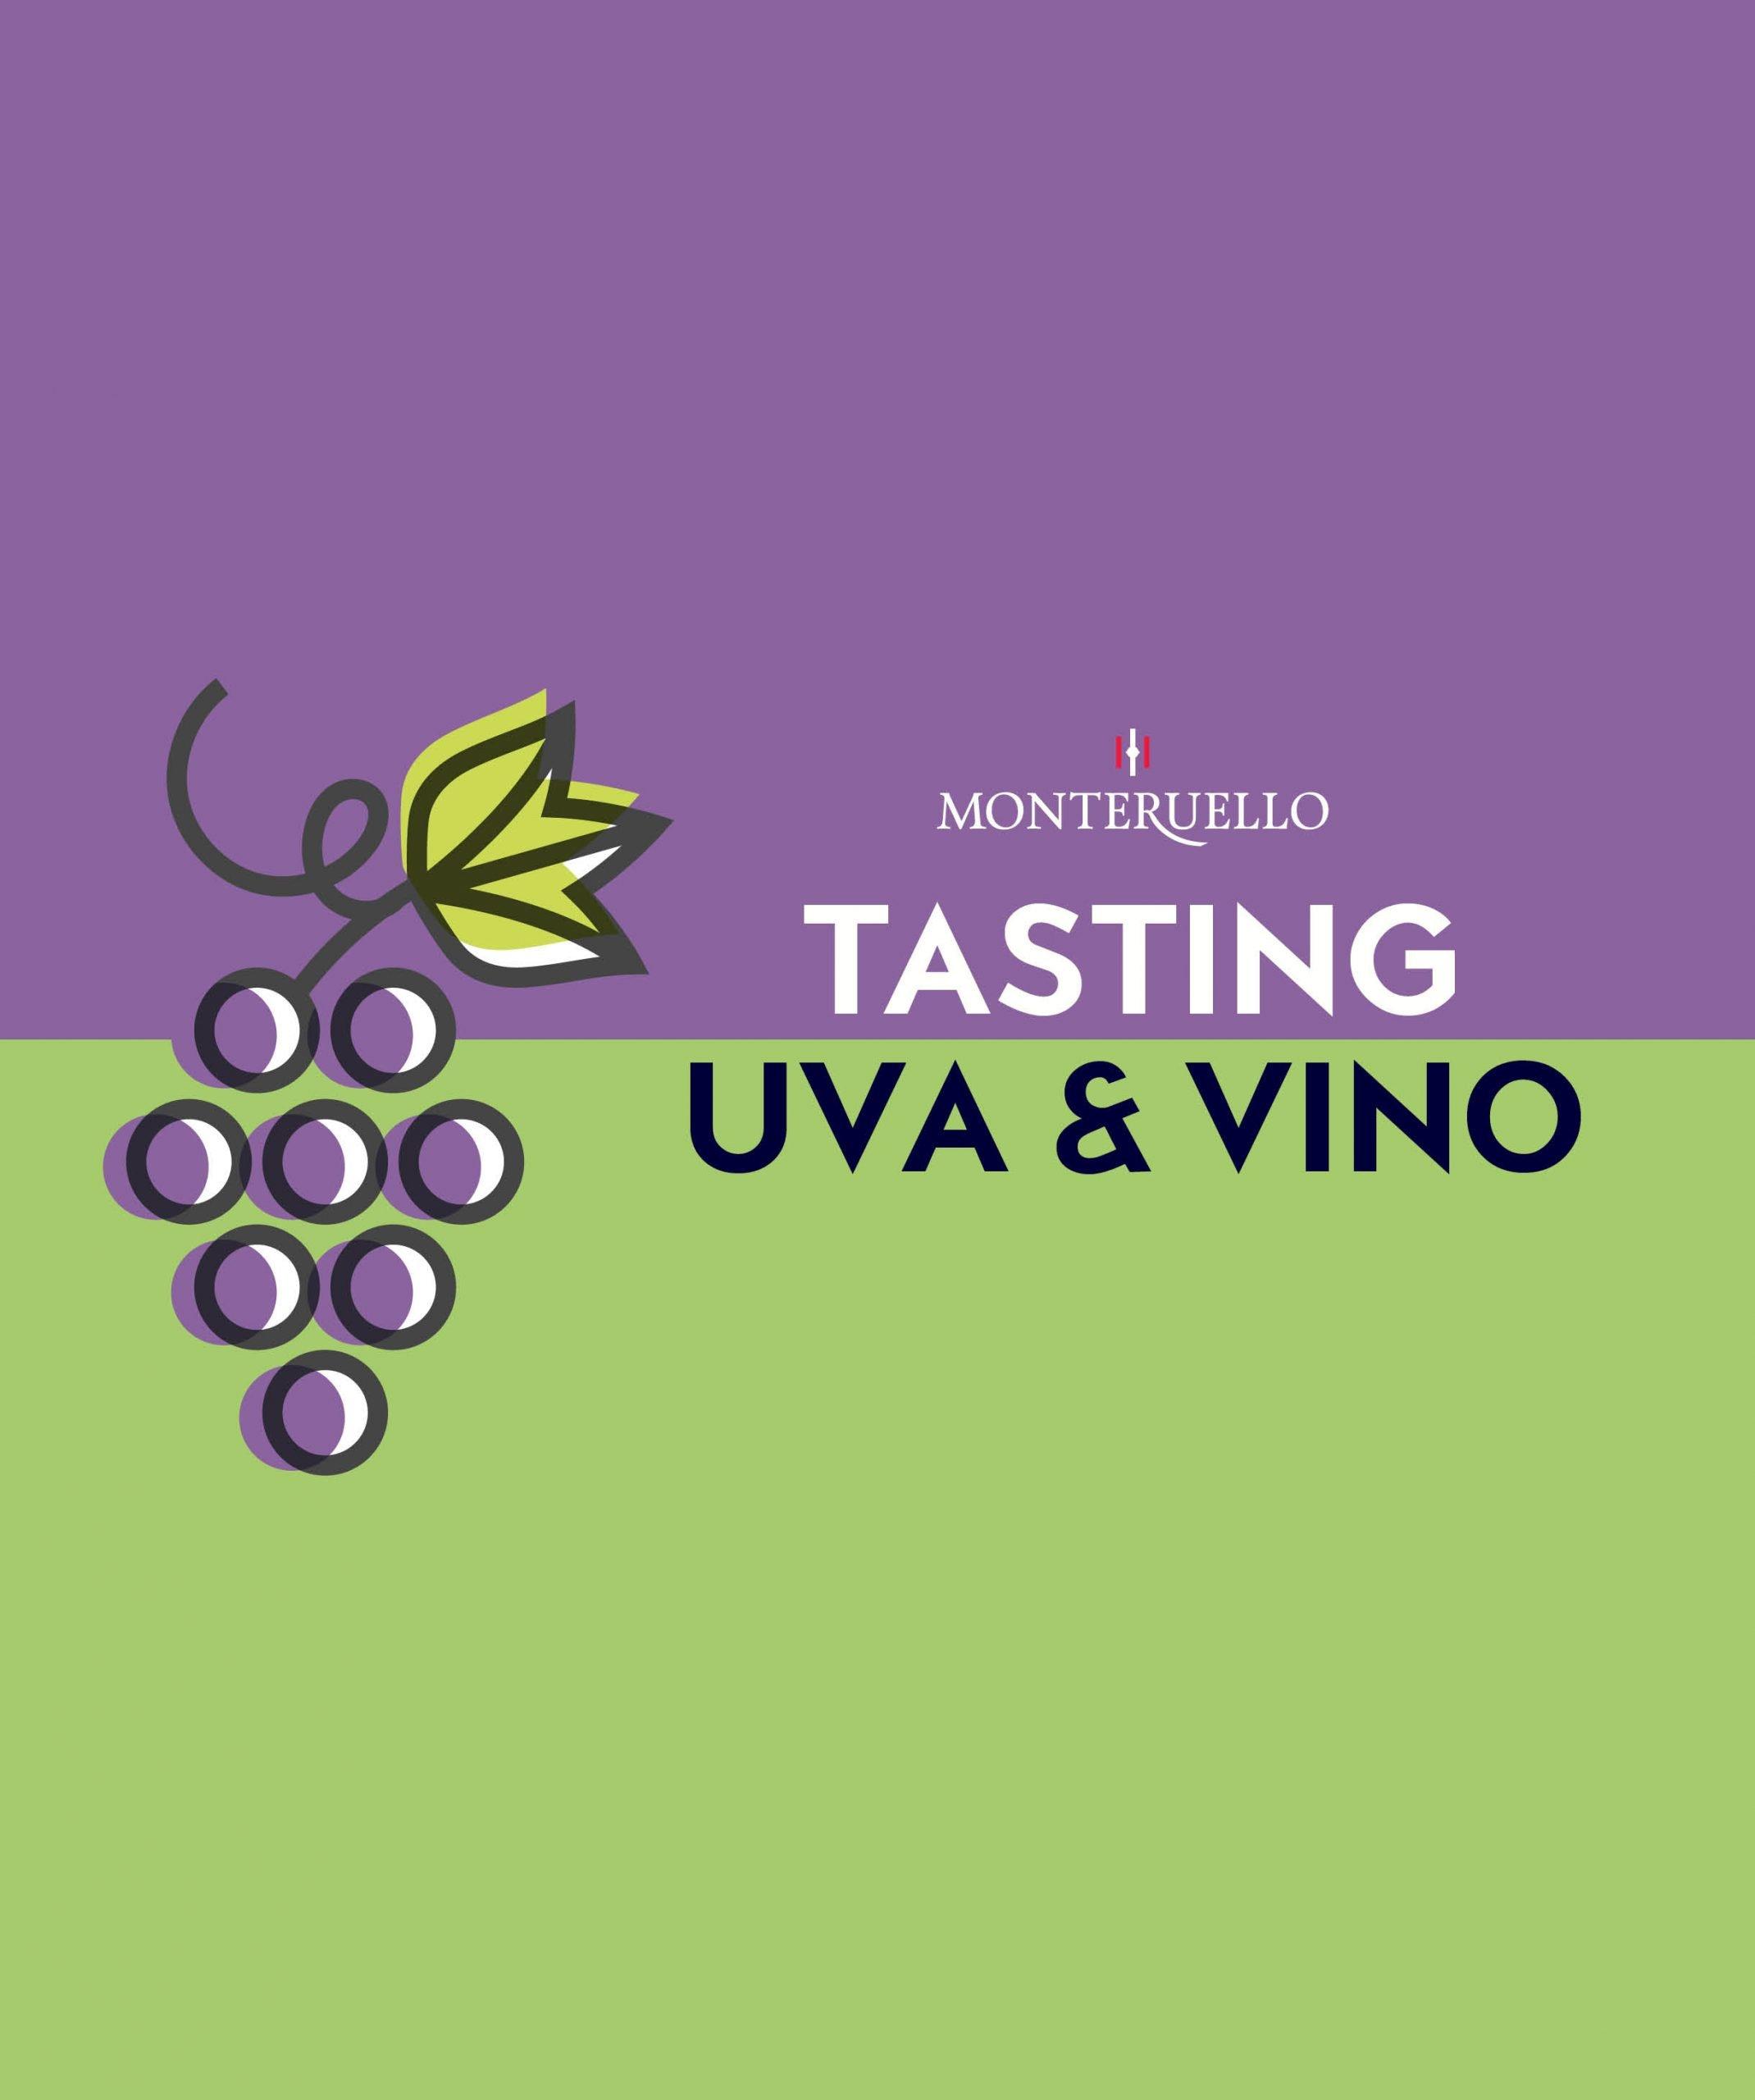 Monteruello | Degustazione Uva & Vino | www.monteruello.it